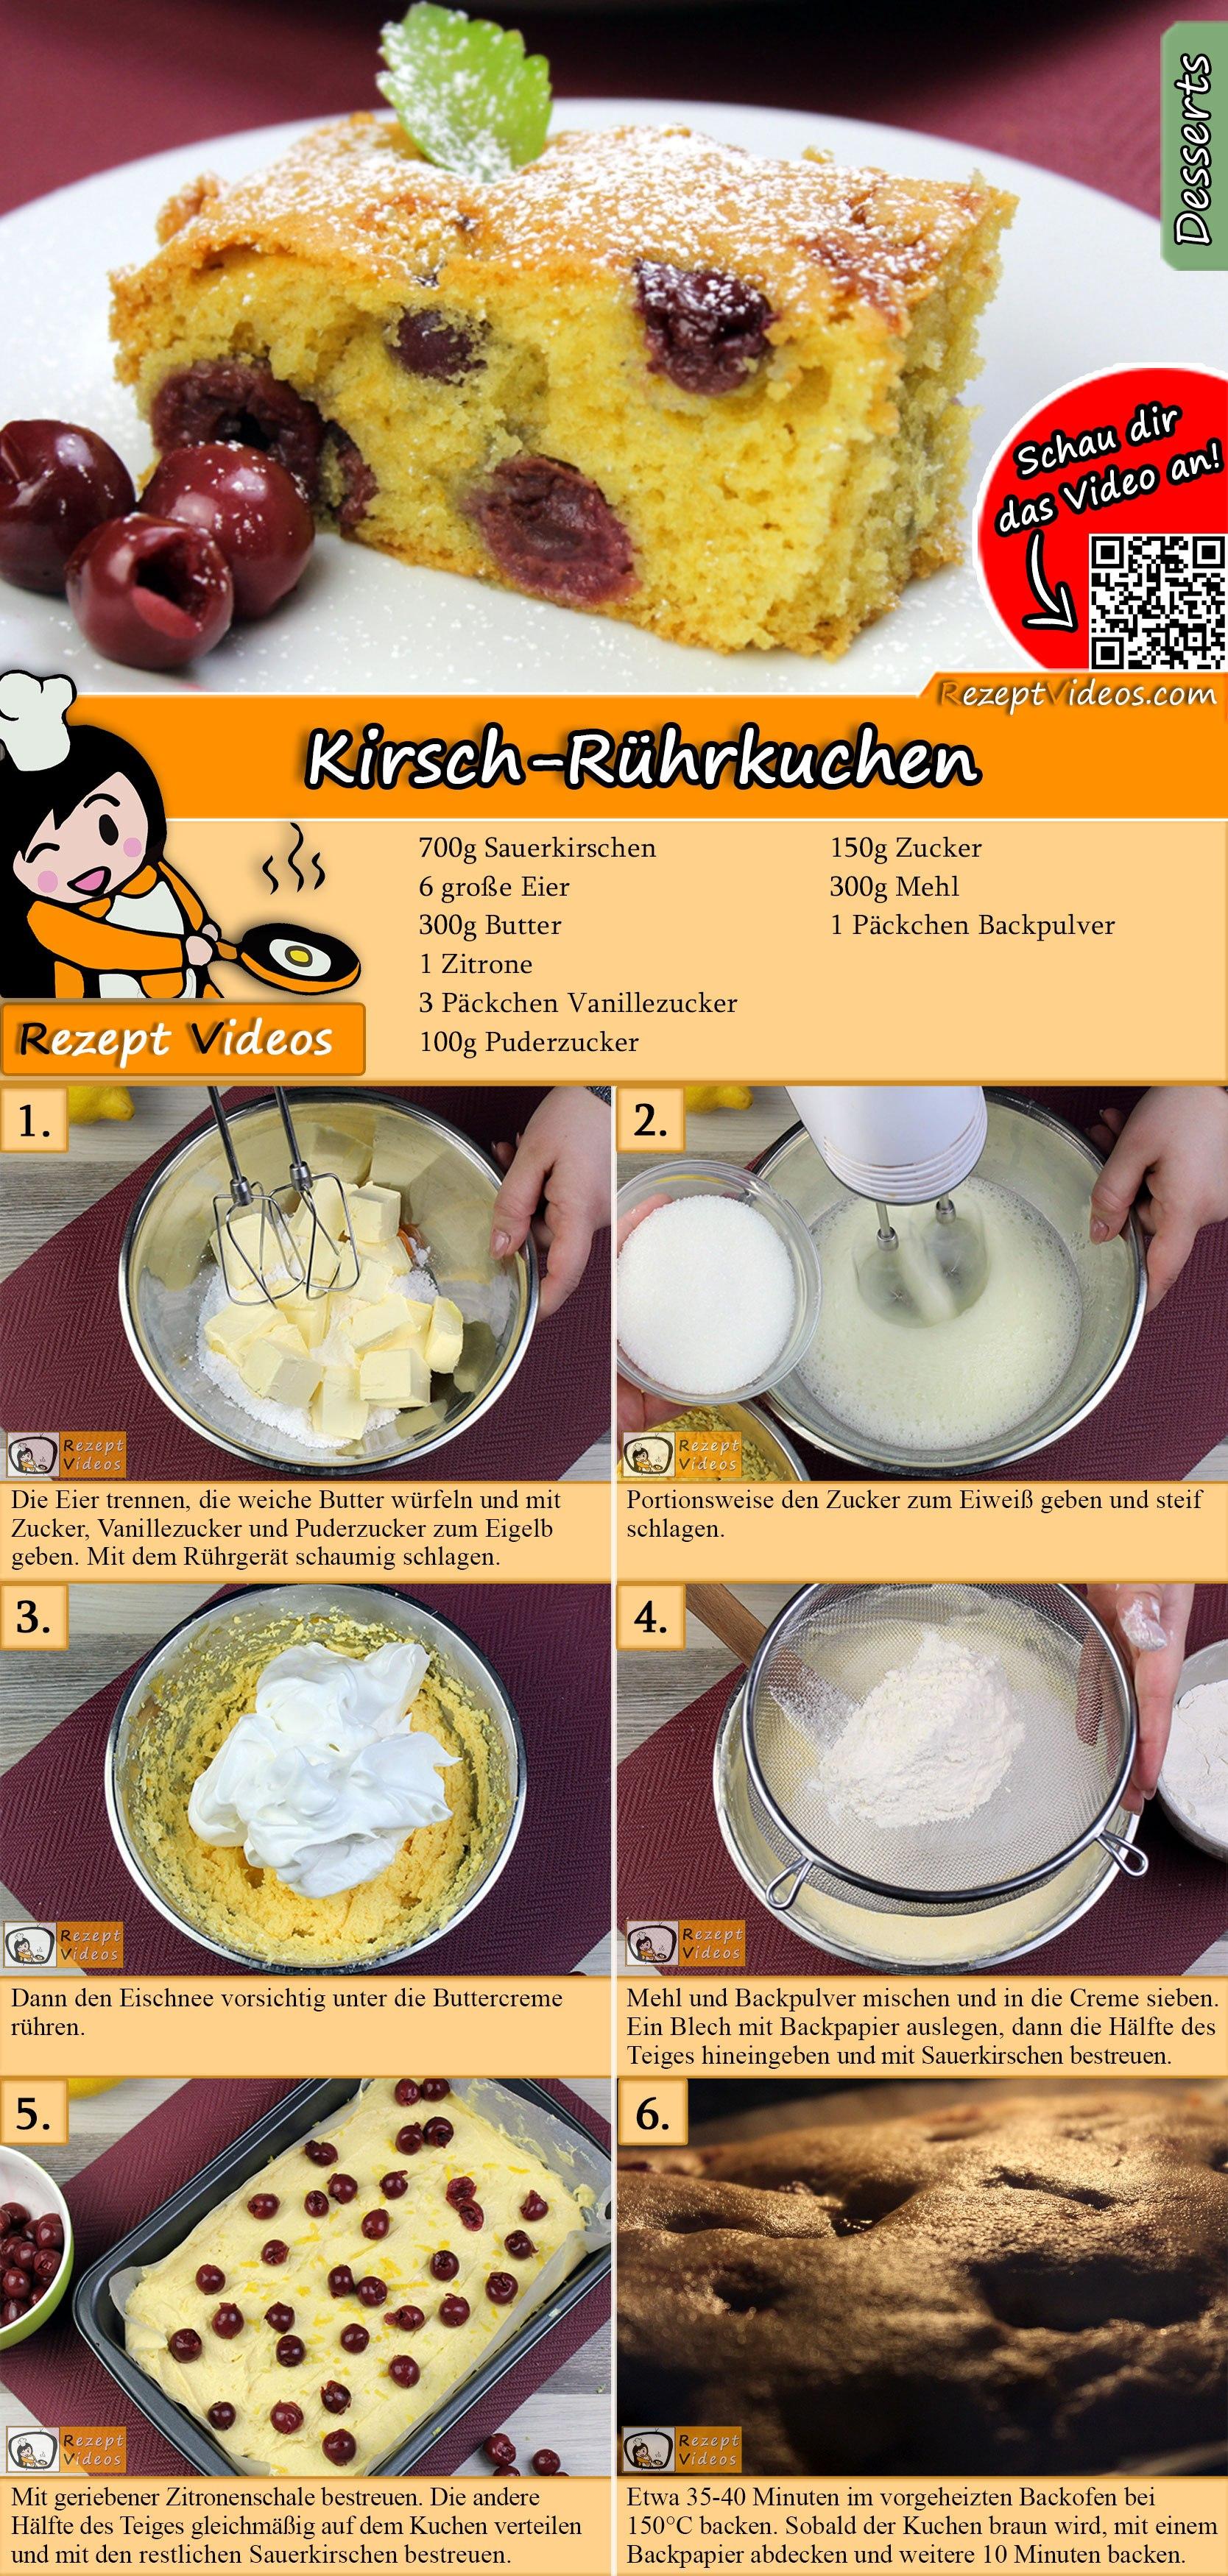 Kirsch-Rührkuchen Rezept mit Video